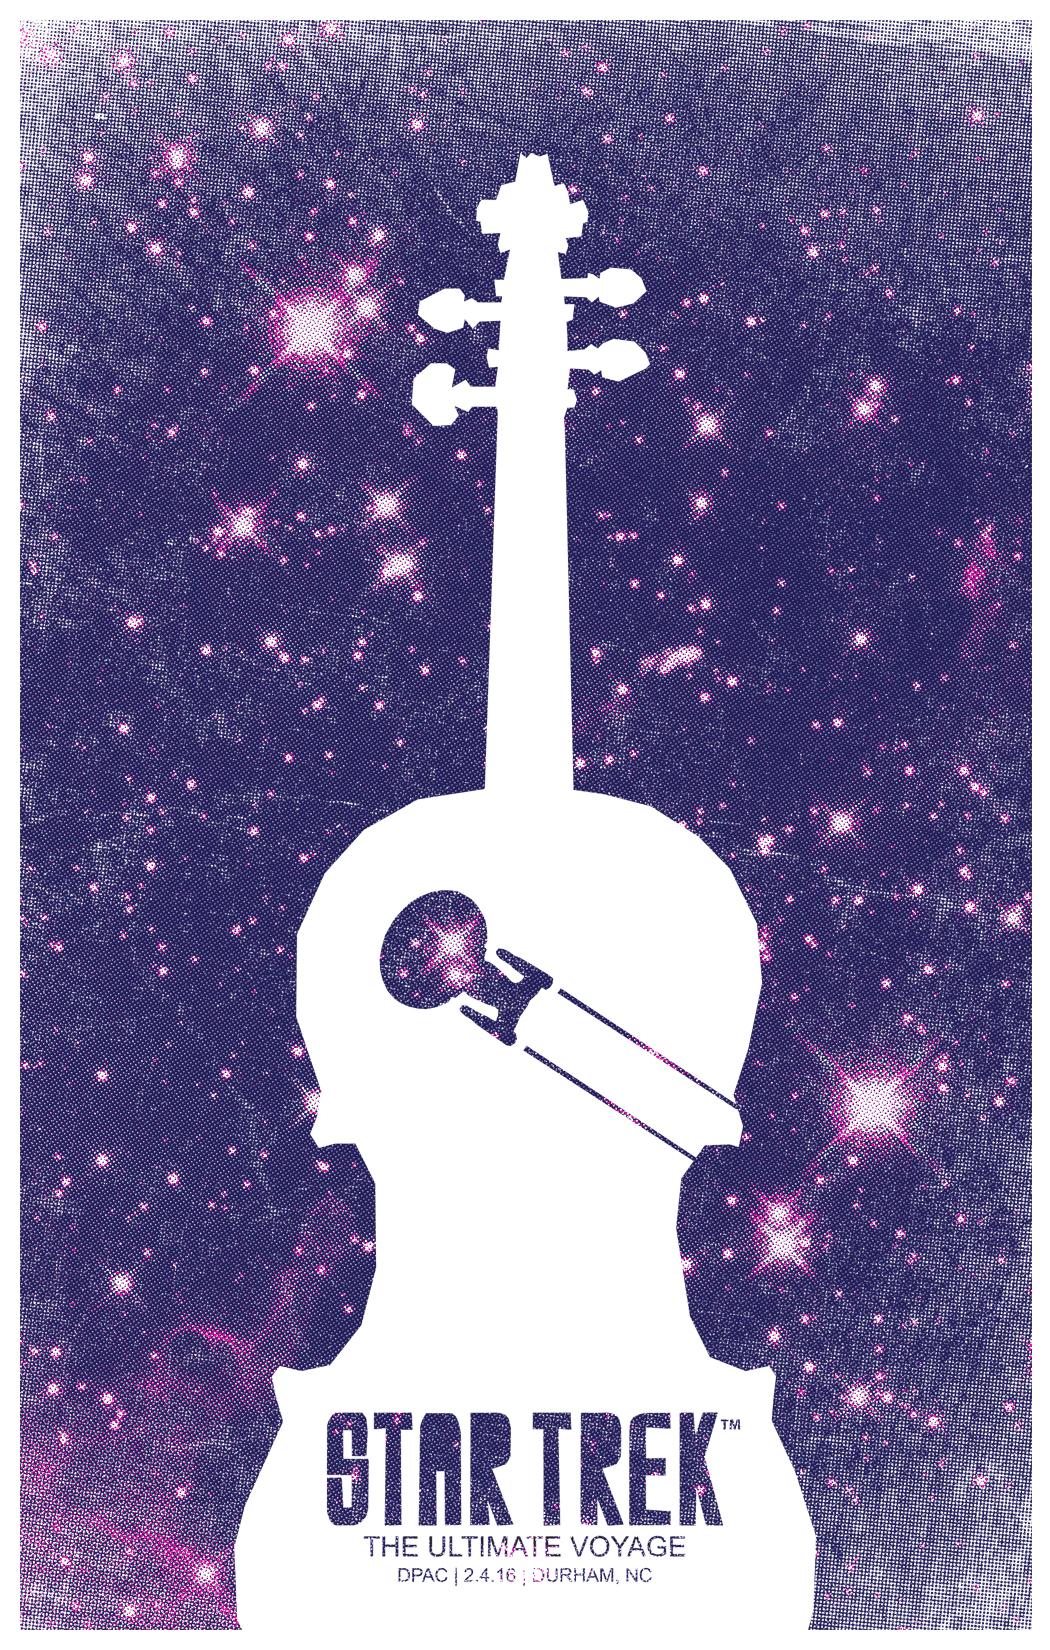 Star Trek Orchestra